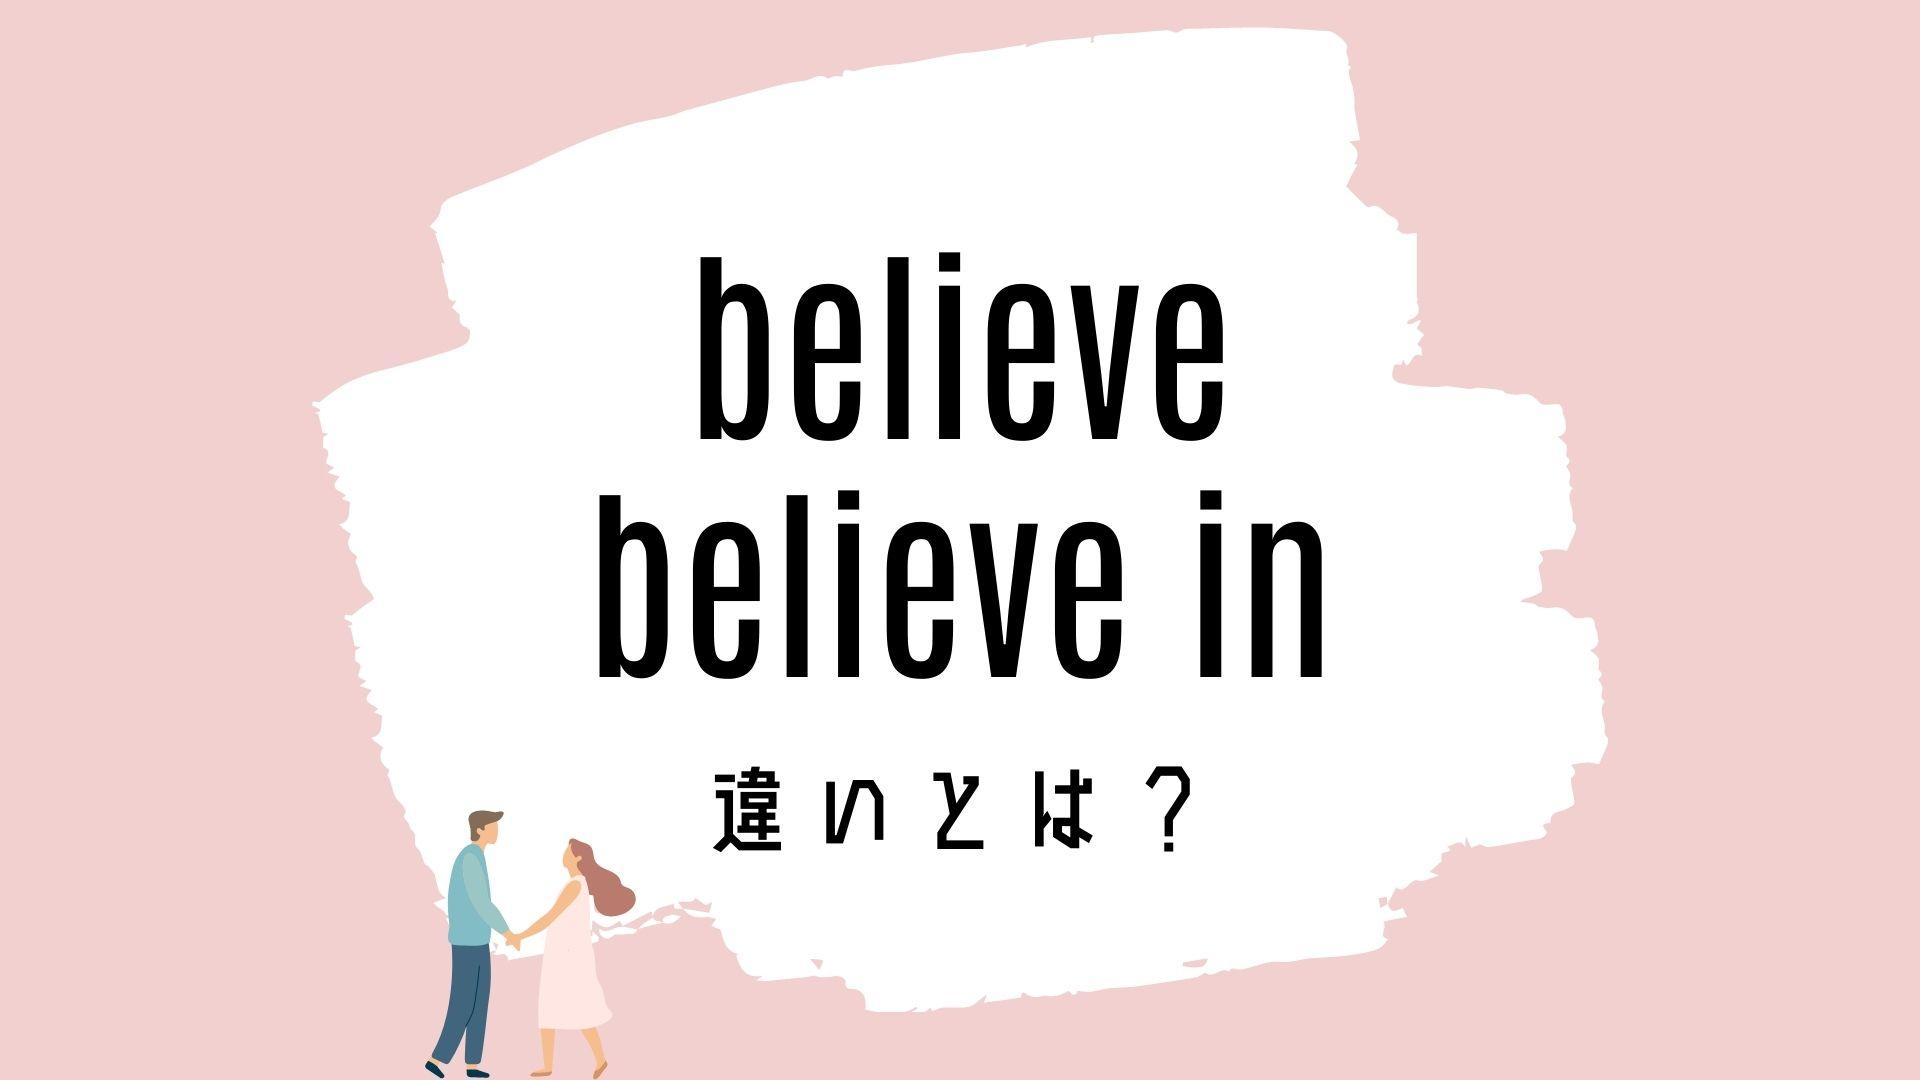 believe / believe inの意味の違いとは?使い方を解説